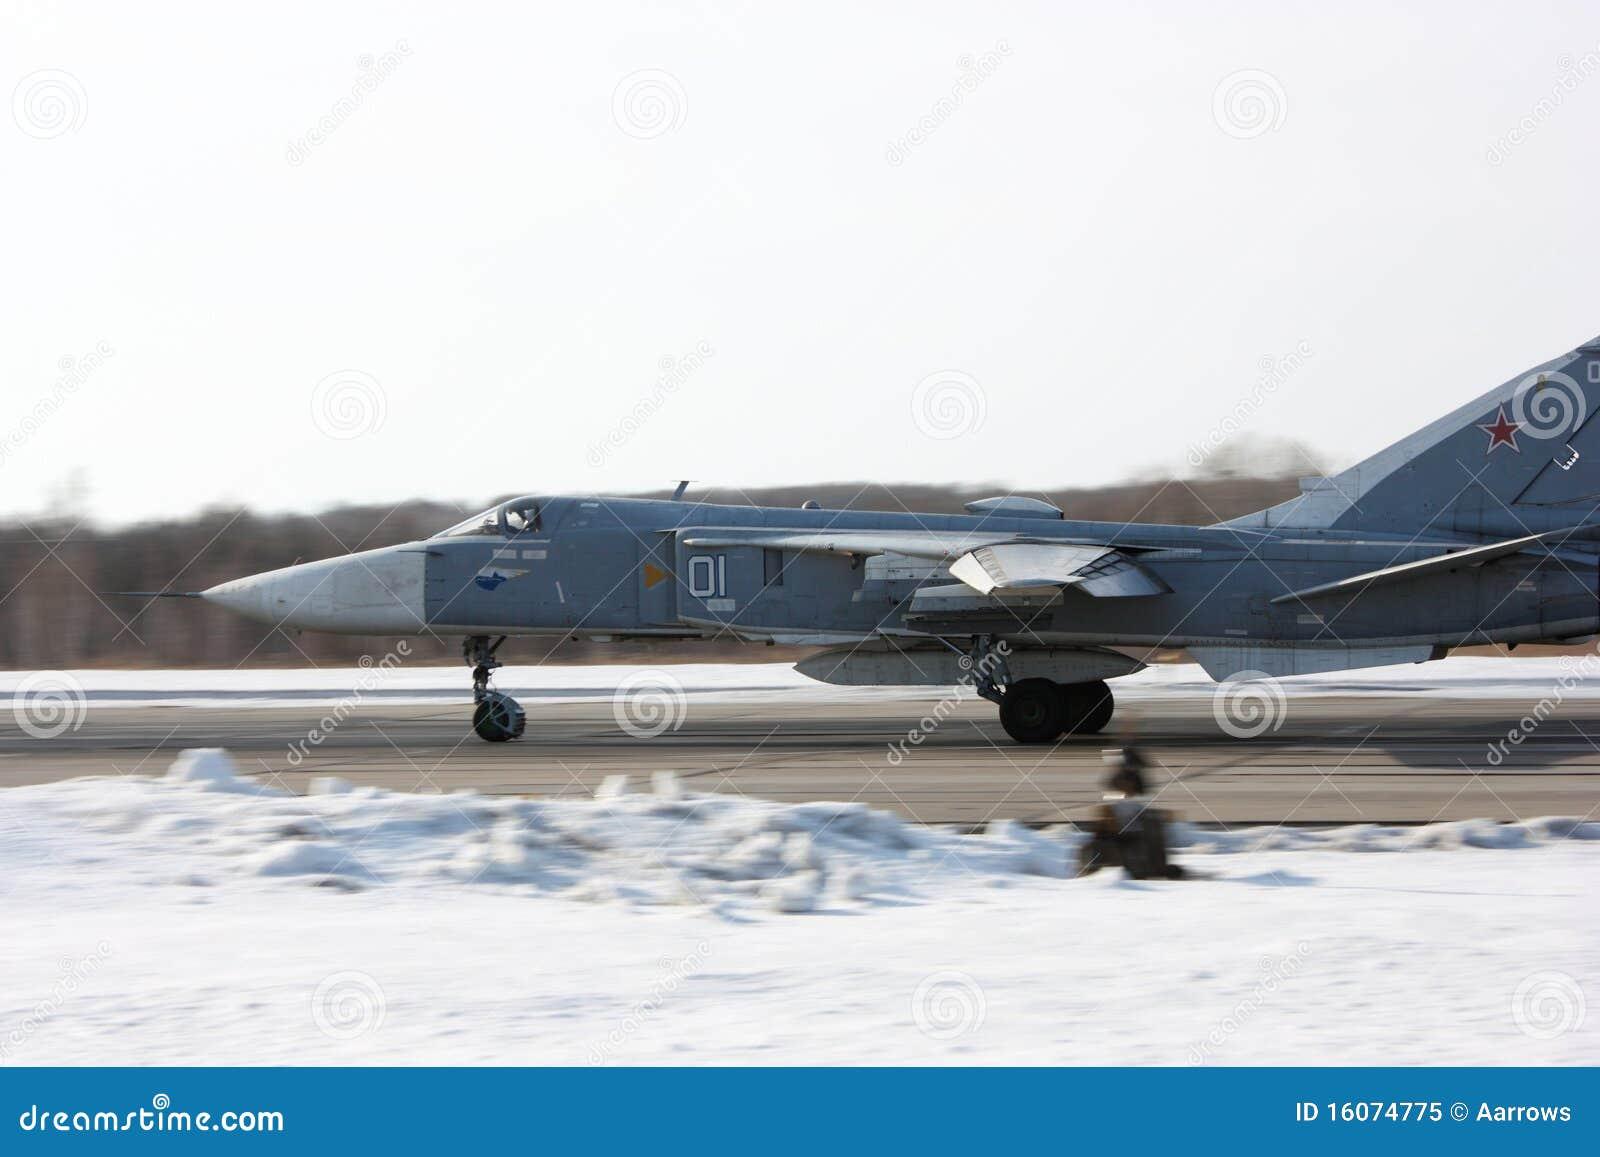 Su-24 Fencer on take off